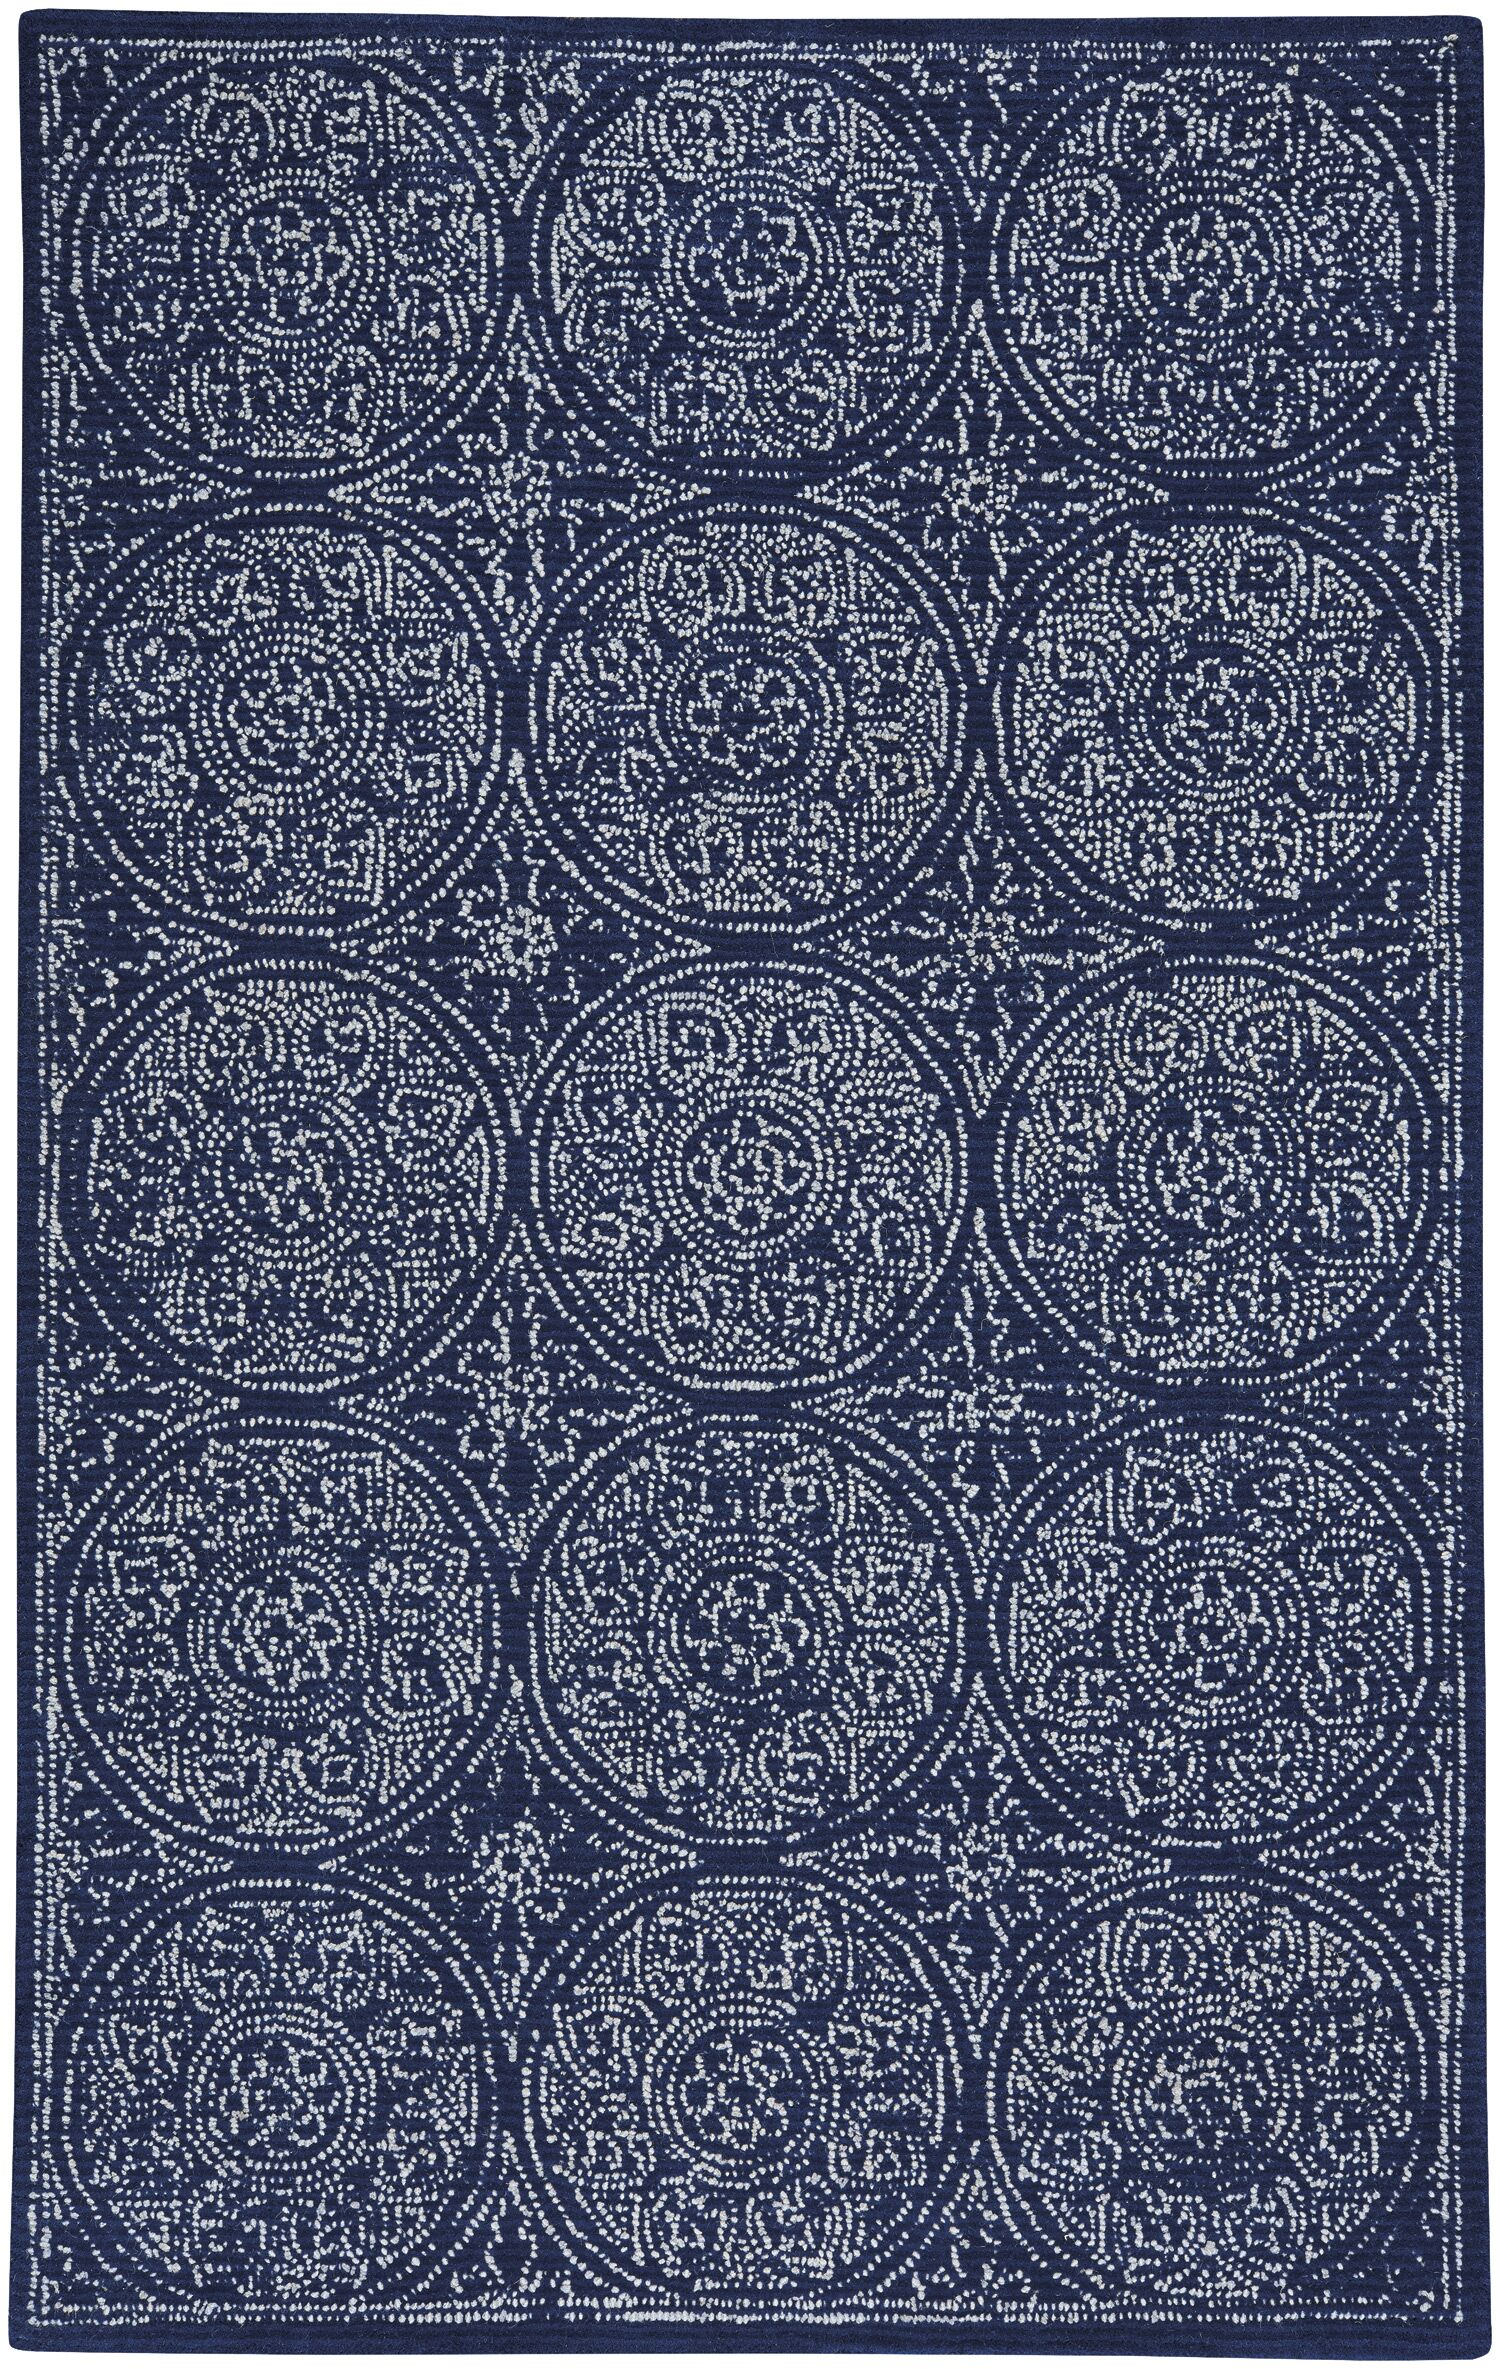 Allure Hand-Tufted Indigo Area Rug Rug Size: 8' x 10'